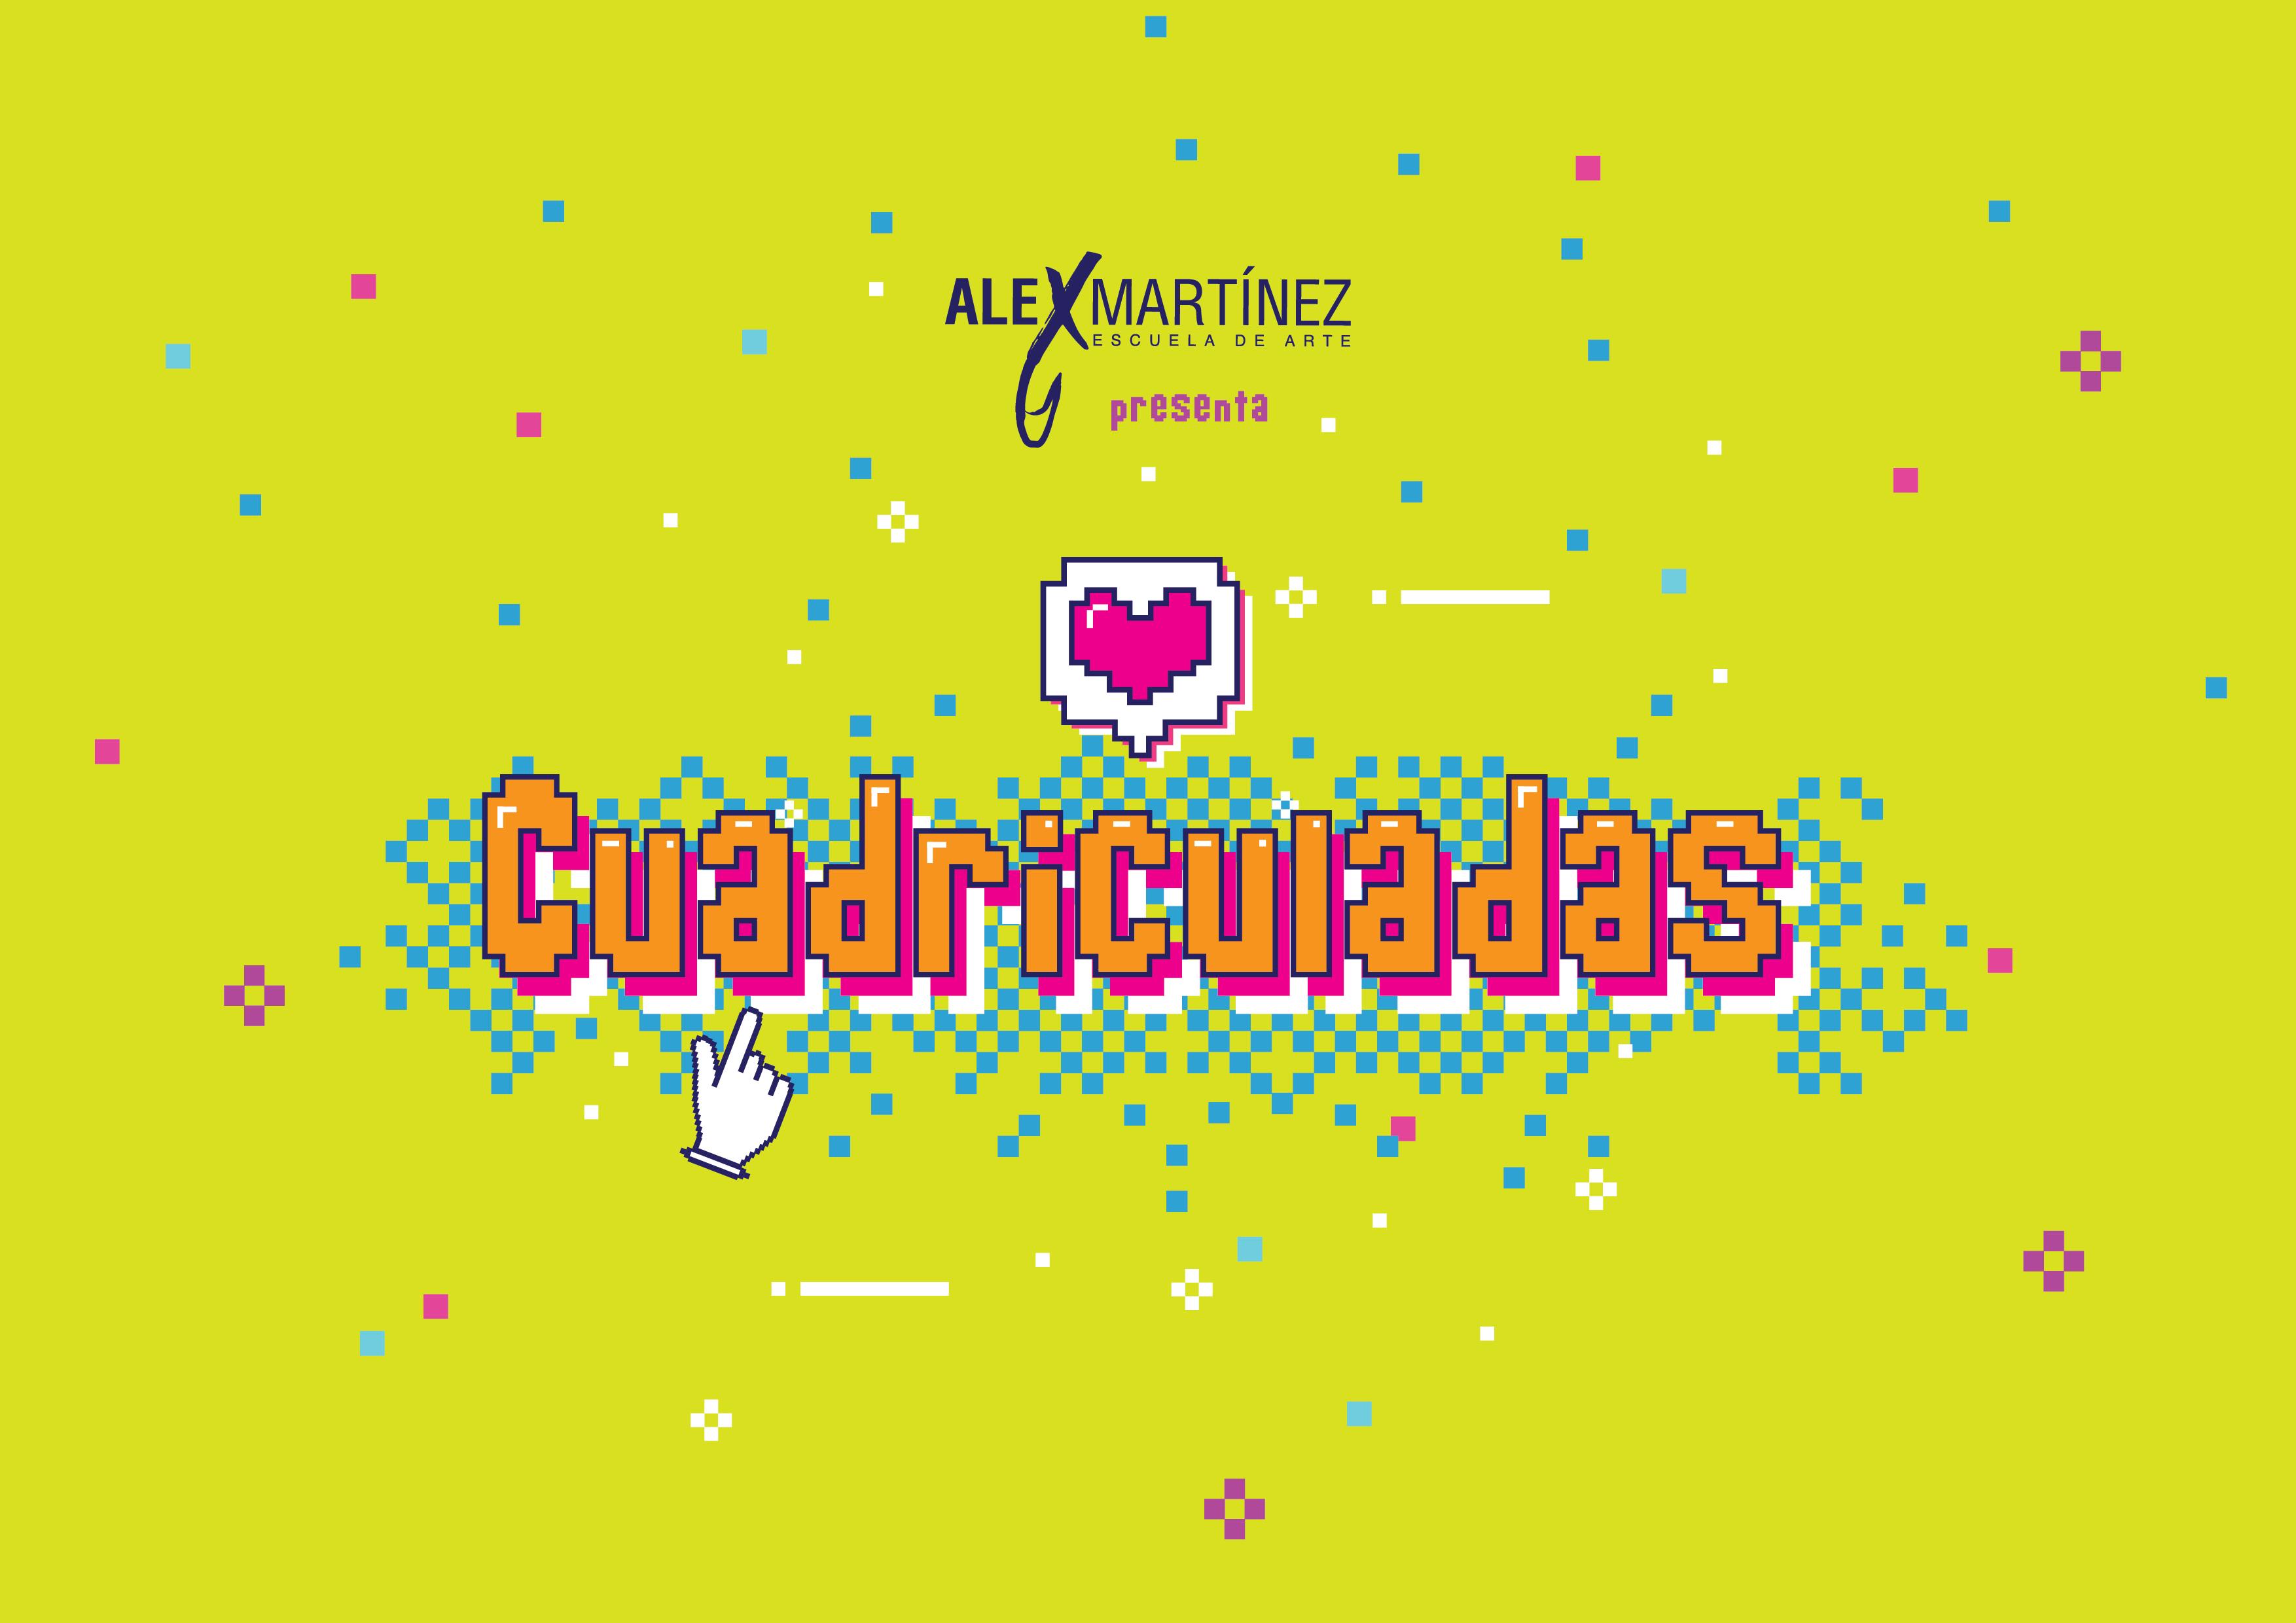 Elementos gráficos - Cuadriculadas-01